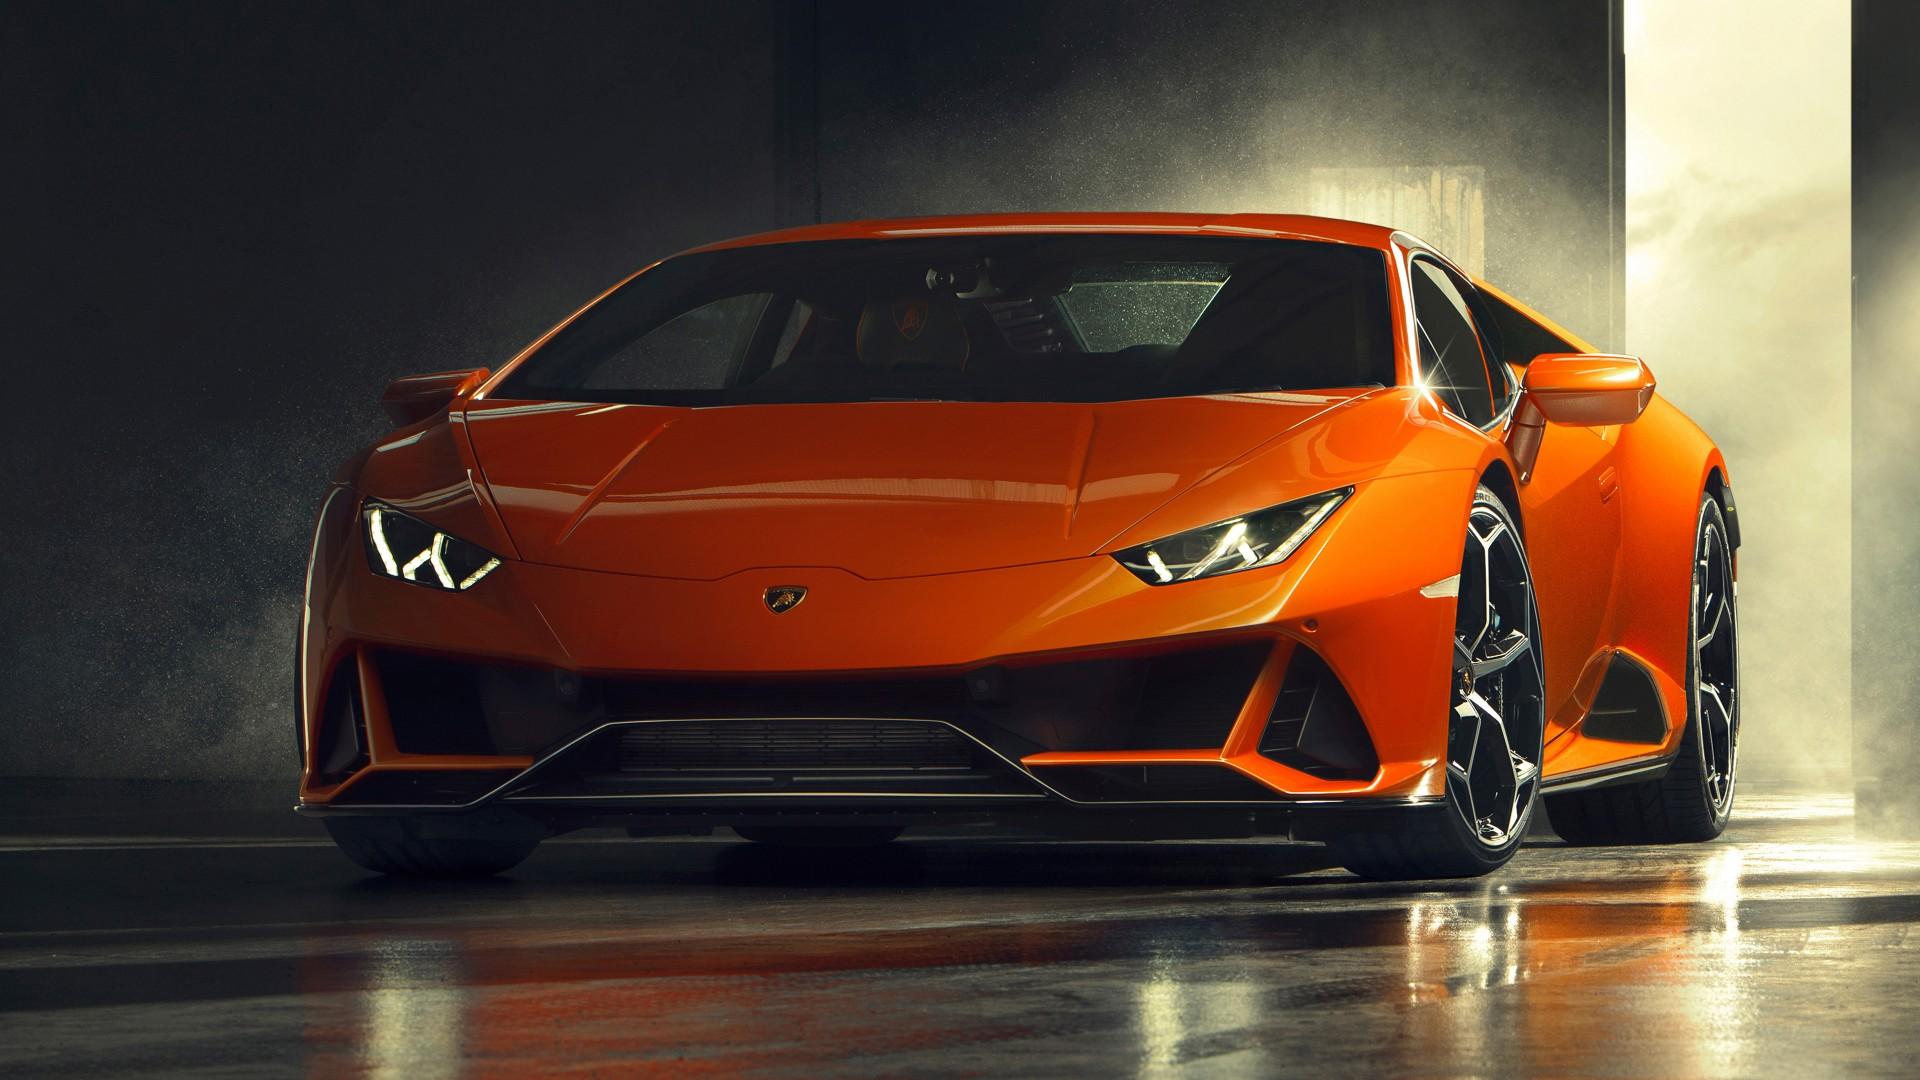 3d Car Wallpaper 1366x768 Lamborghini Huracan Evo 2019 4k Wallpapers Hd Wallpapers